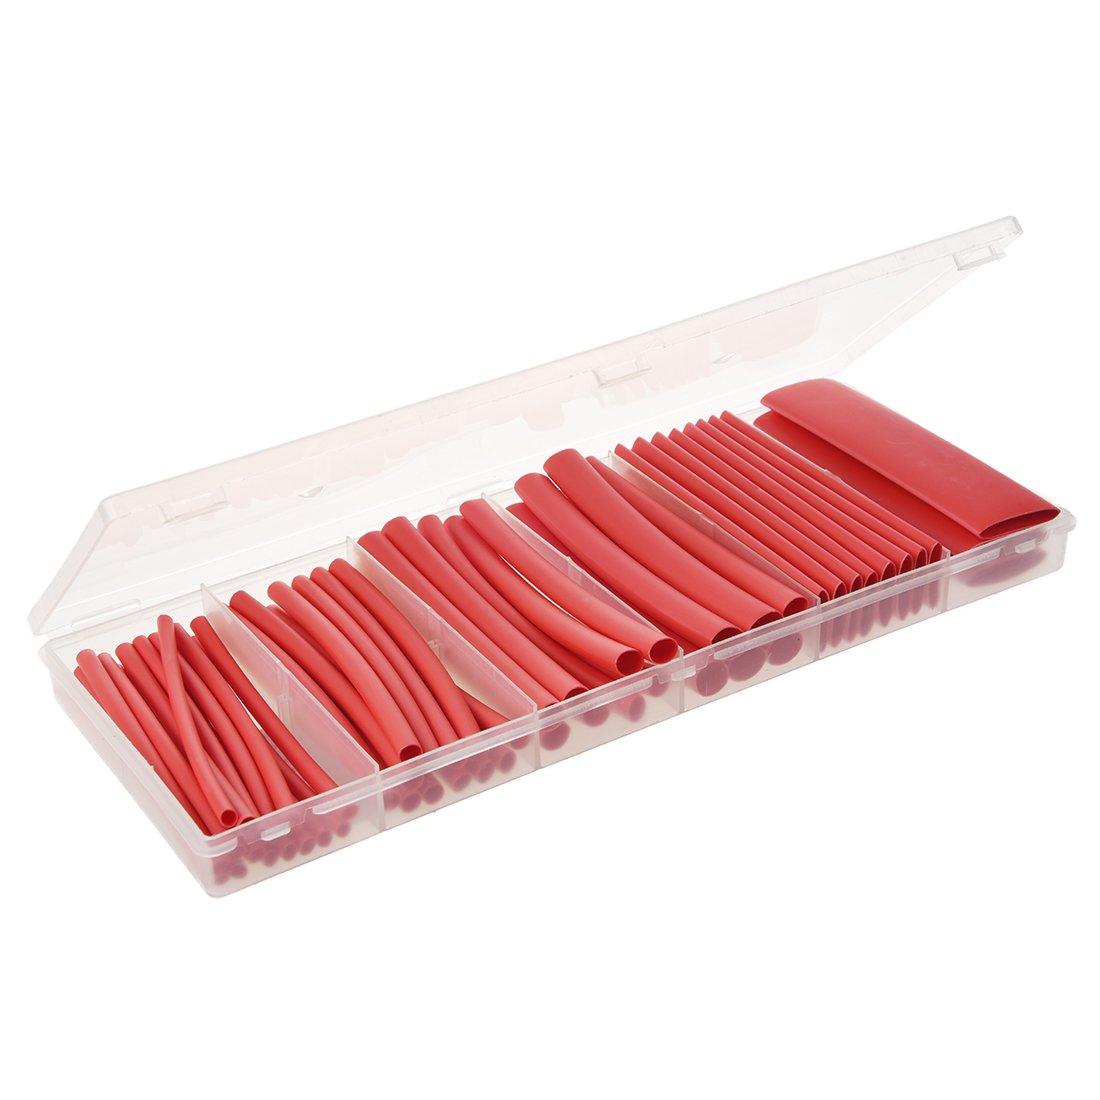 SODIAL 53PCS Red Heat Shrink Adhesive glue lined Tube 3:1 Heatshrink Tubing wrap wire R Heat Shrink Tubing